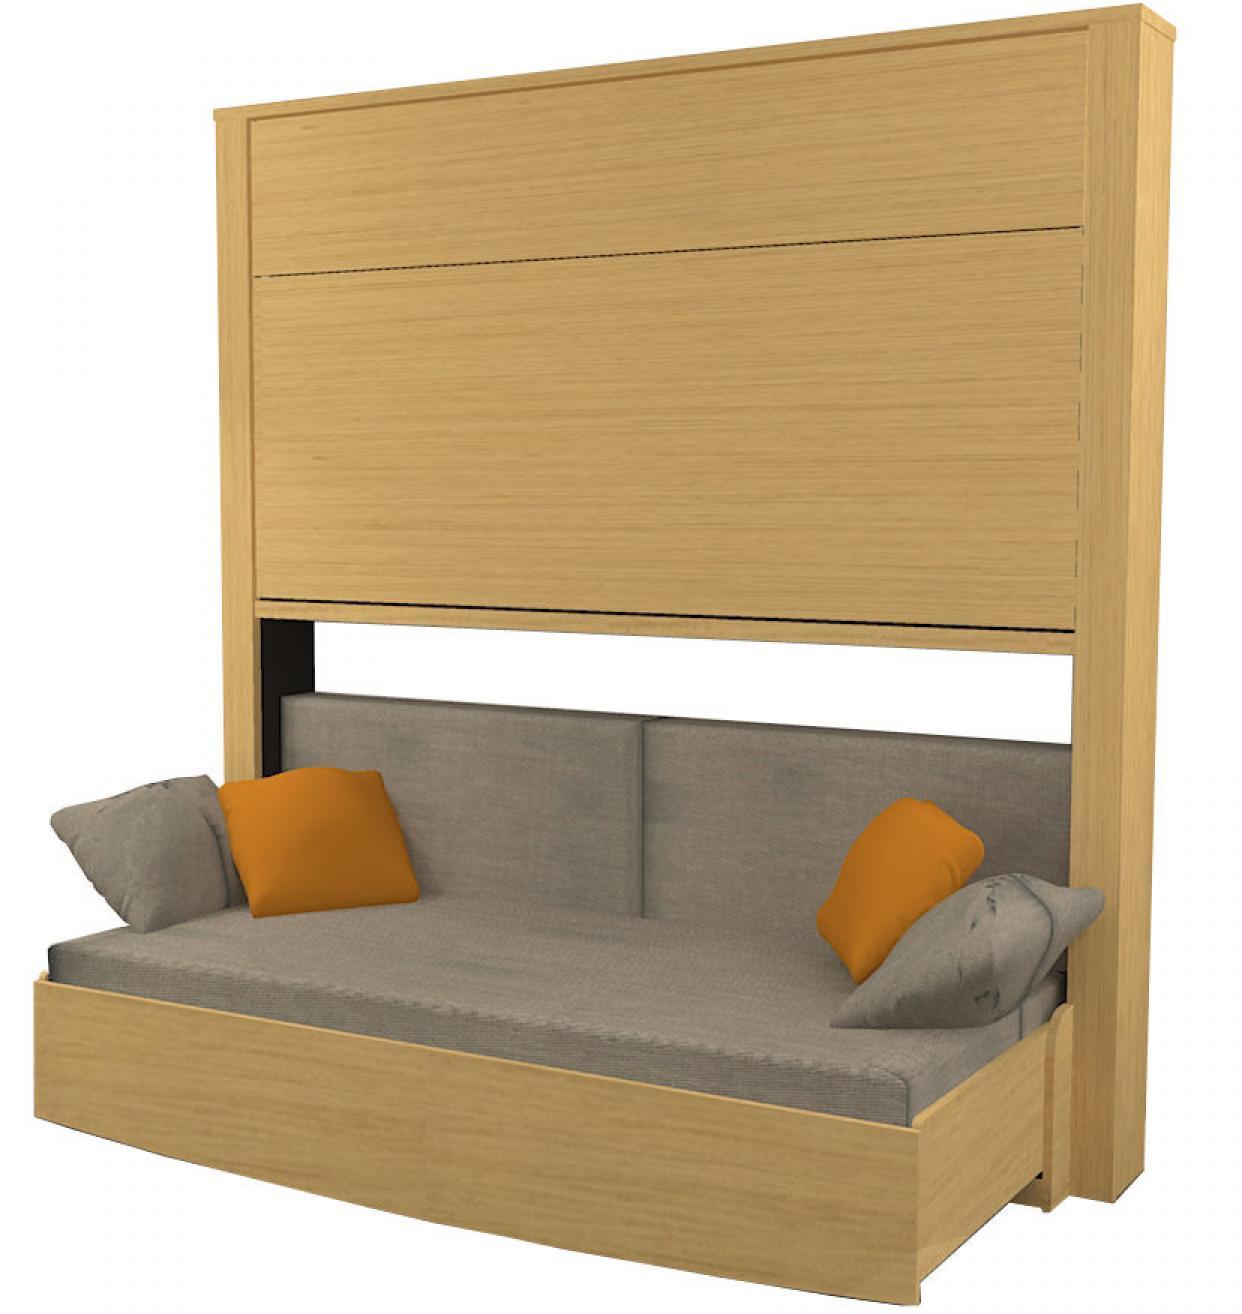 lit superpose canape gascity for. Black Bedroom Furniture Sets. Home Design Ideas